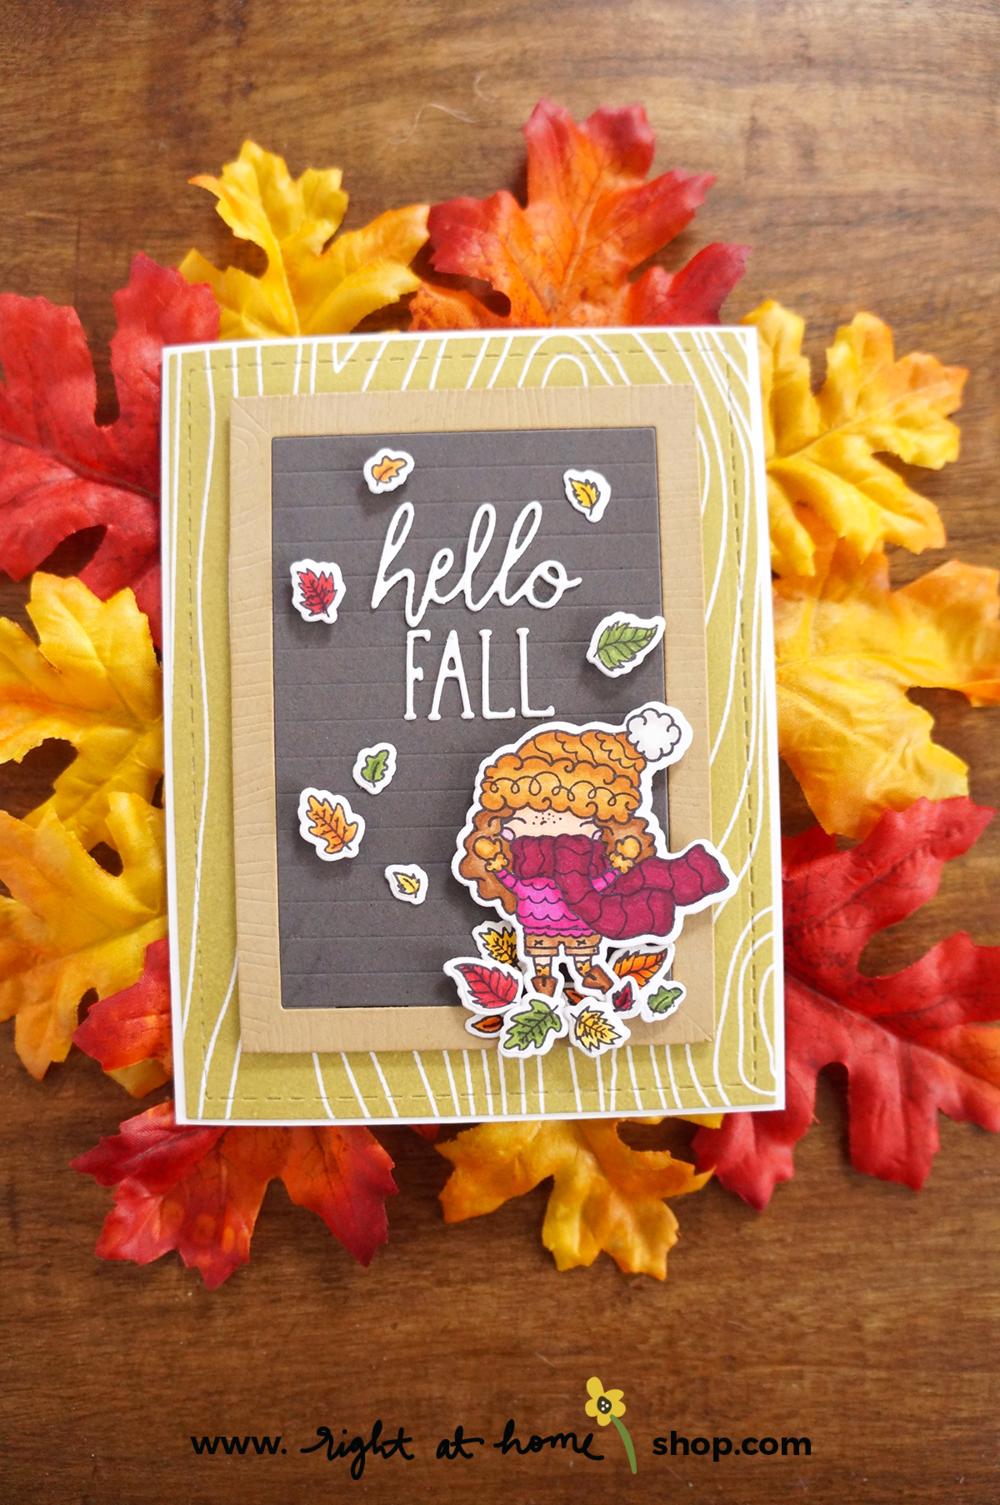 Hello Fall Pumpkin Spice Season Letterboard Card // rightathomeshop.com/blog